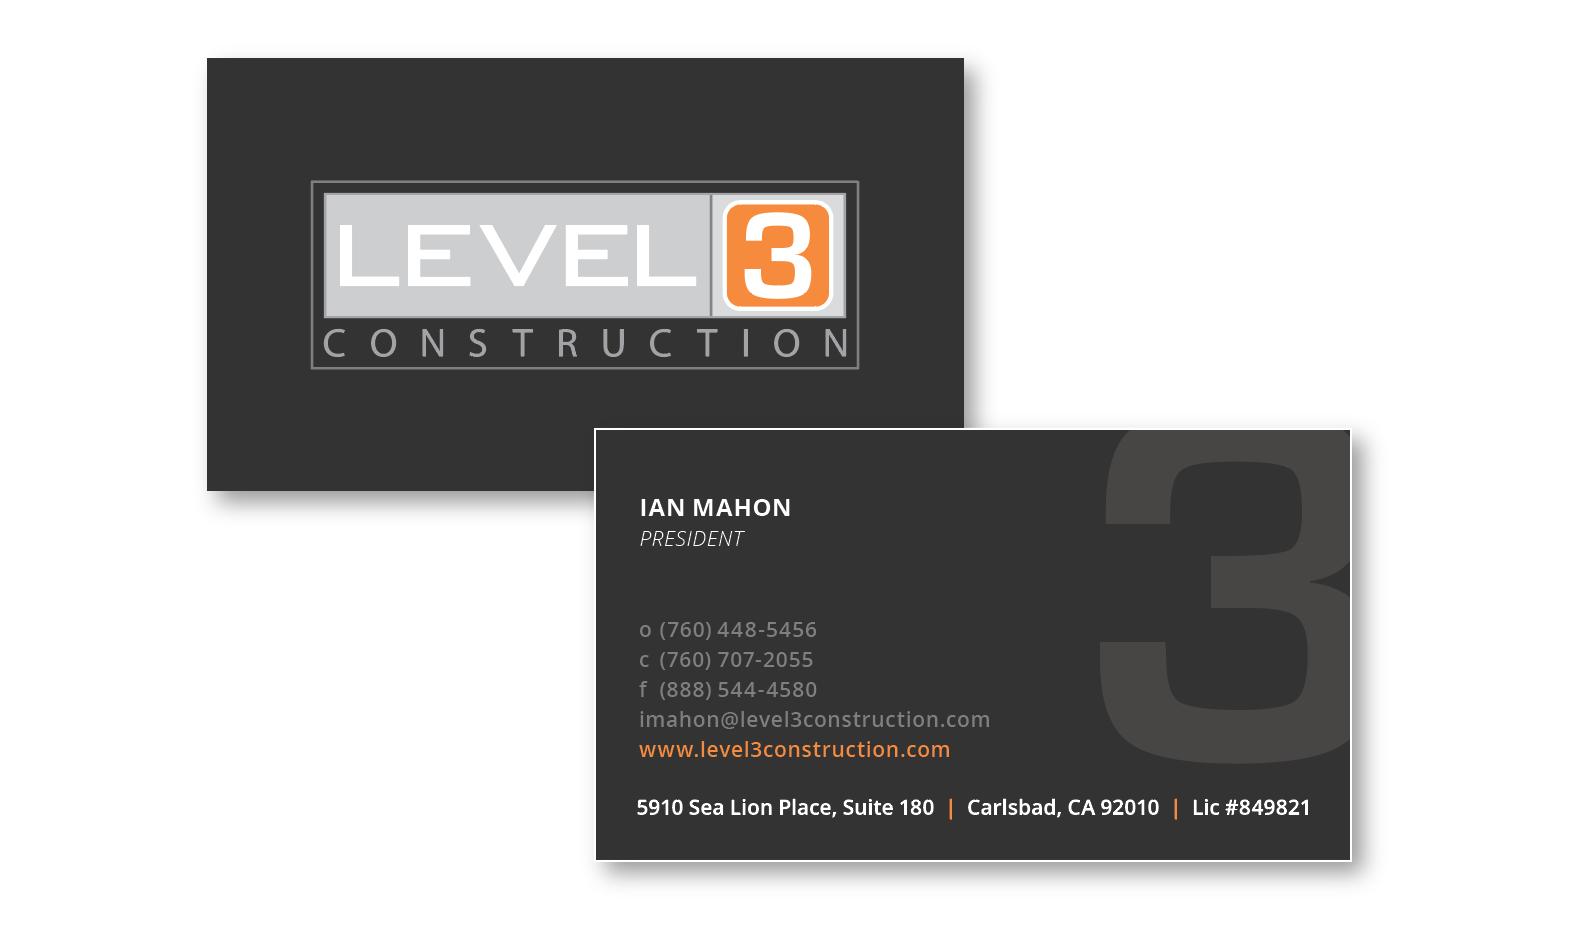 LEVEL 3 CONSTRUCTION on Behance